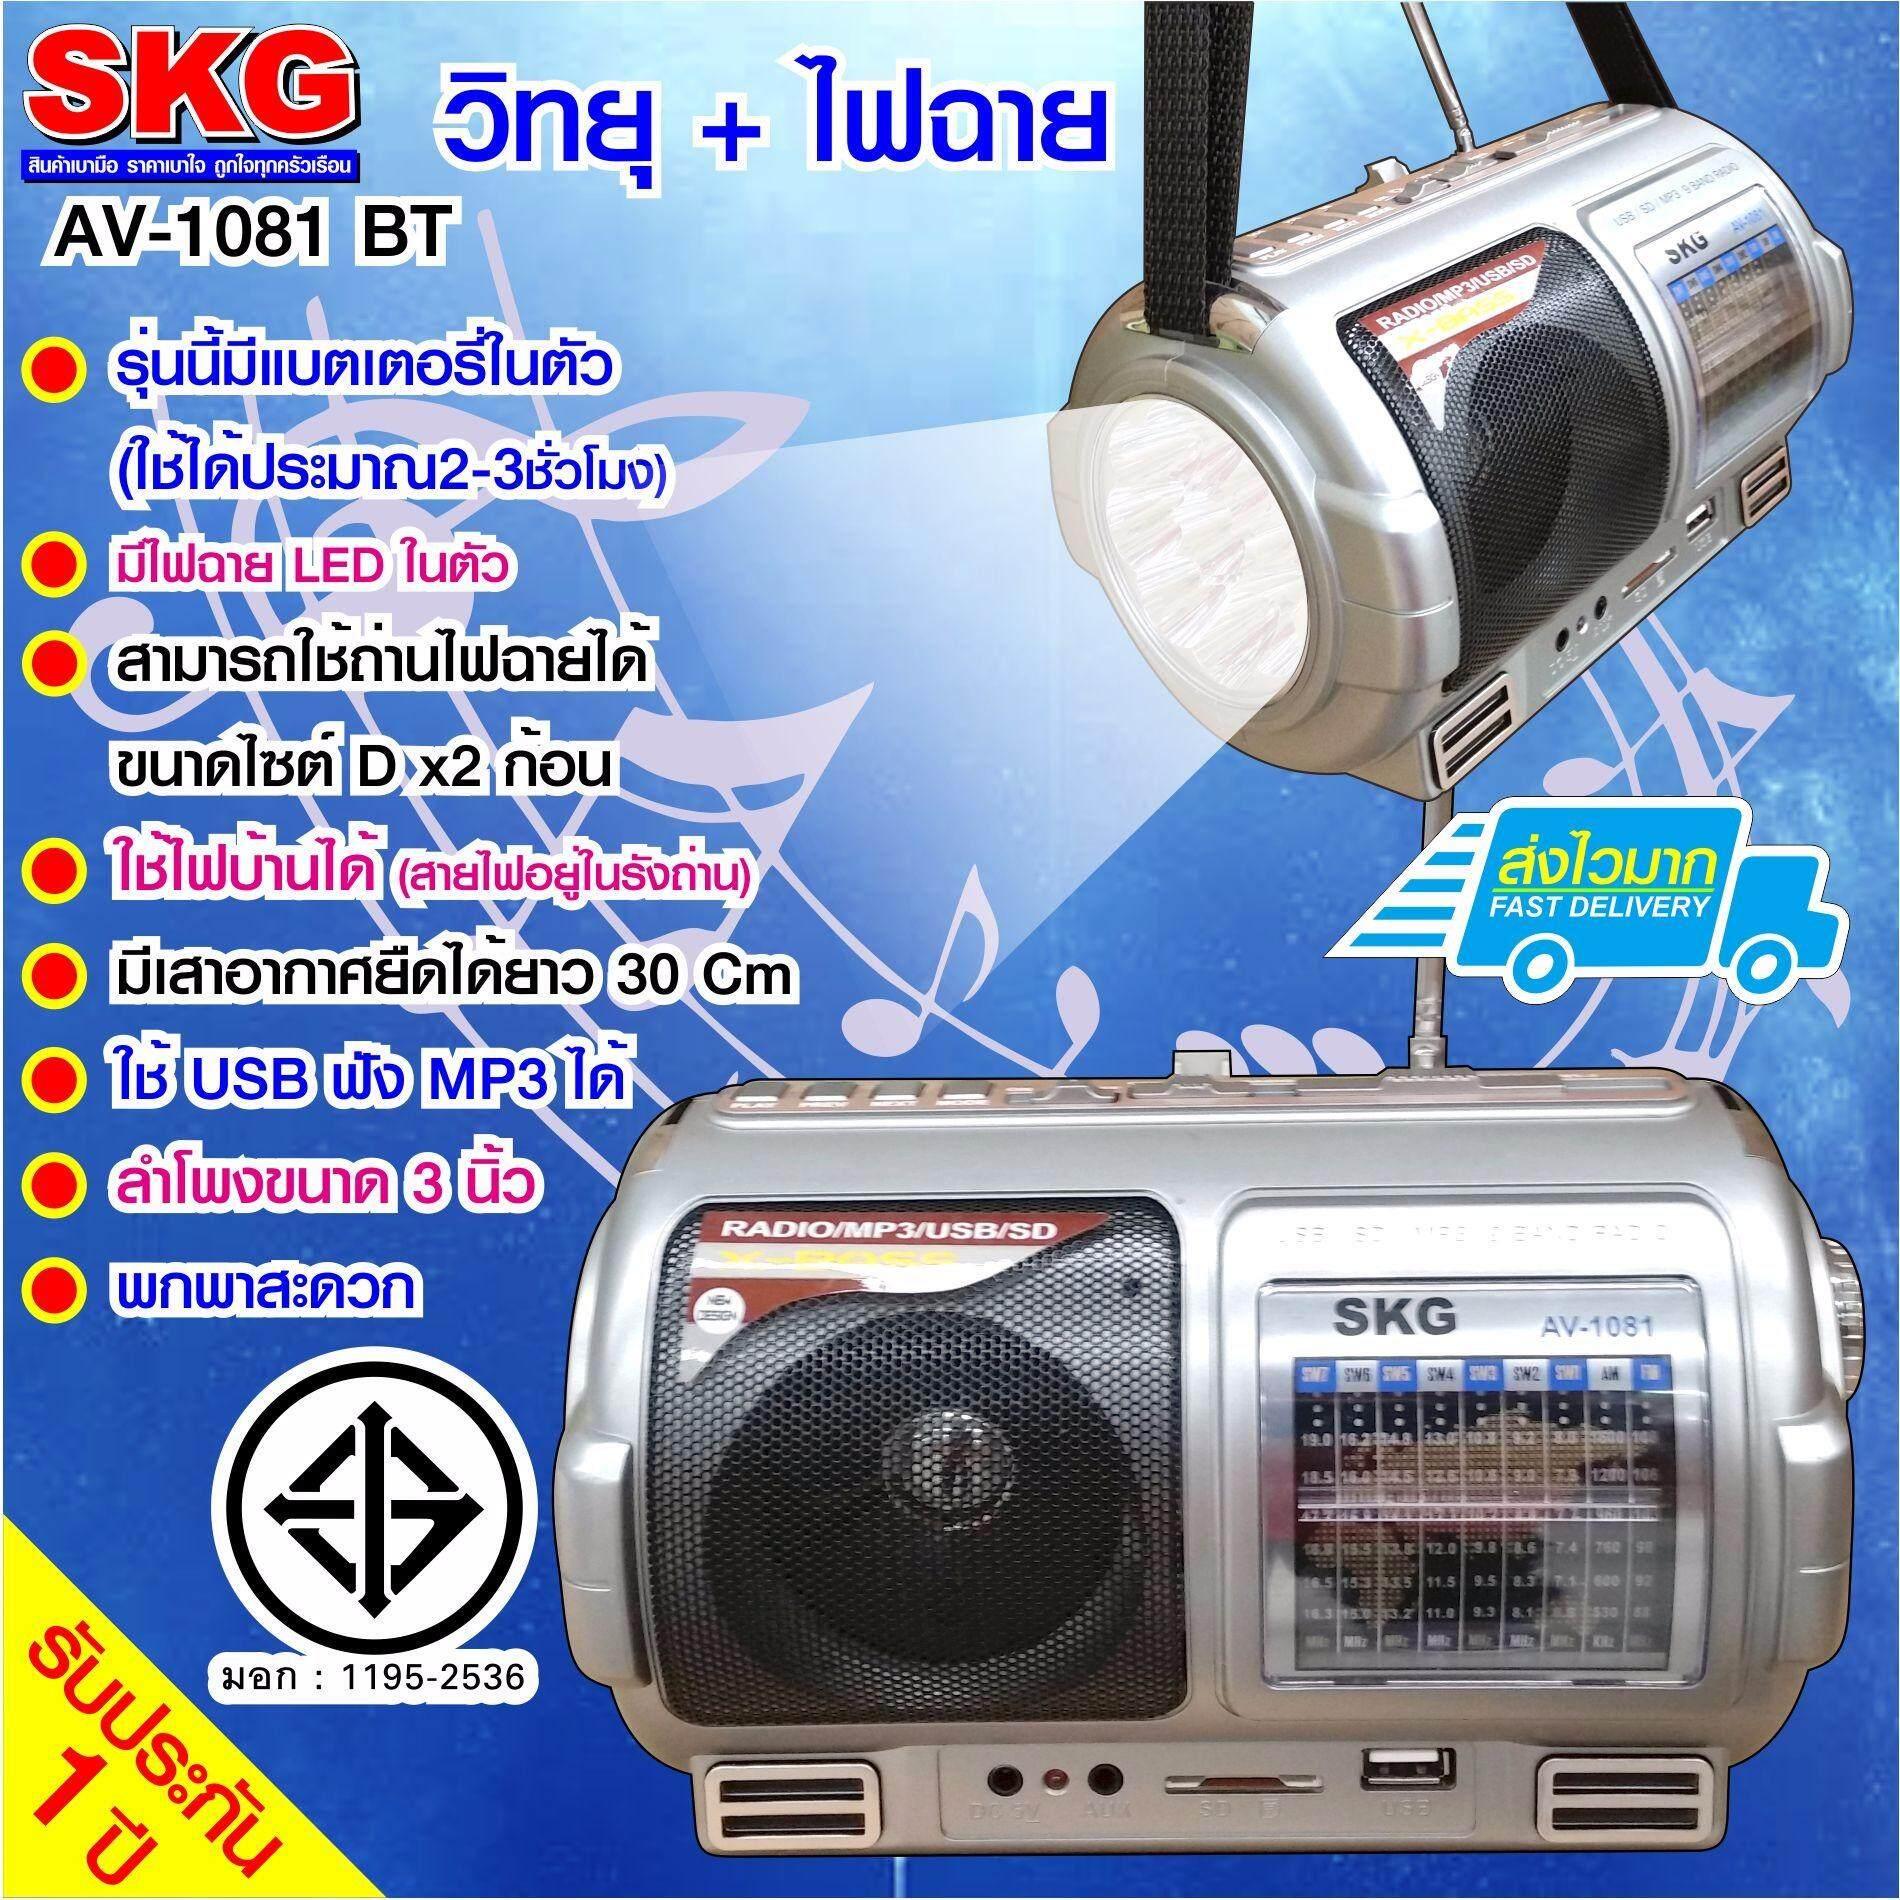 SKG วิทยุ + ไฟฉาย รุ่น AV-1081 - สีเงิน